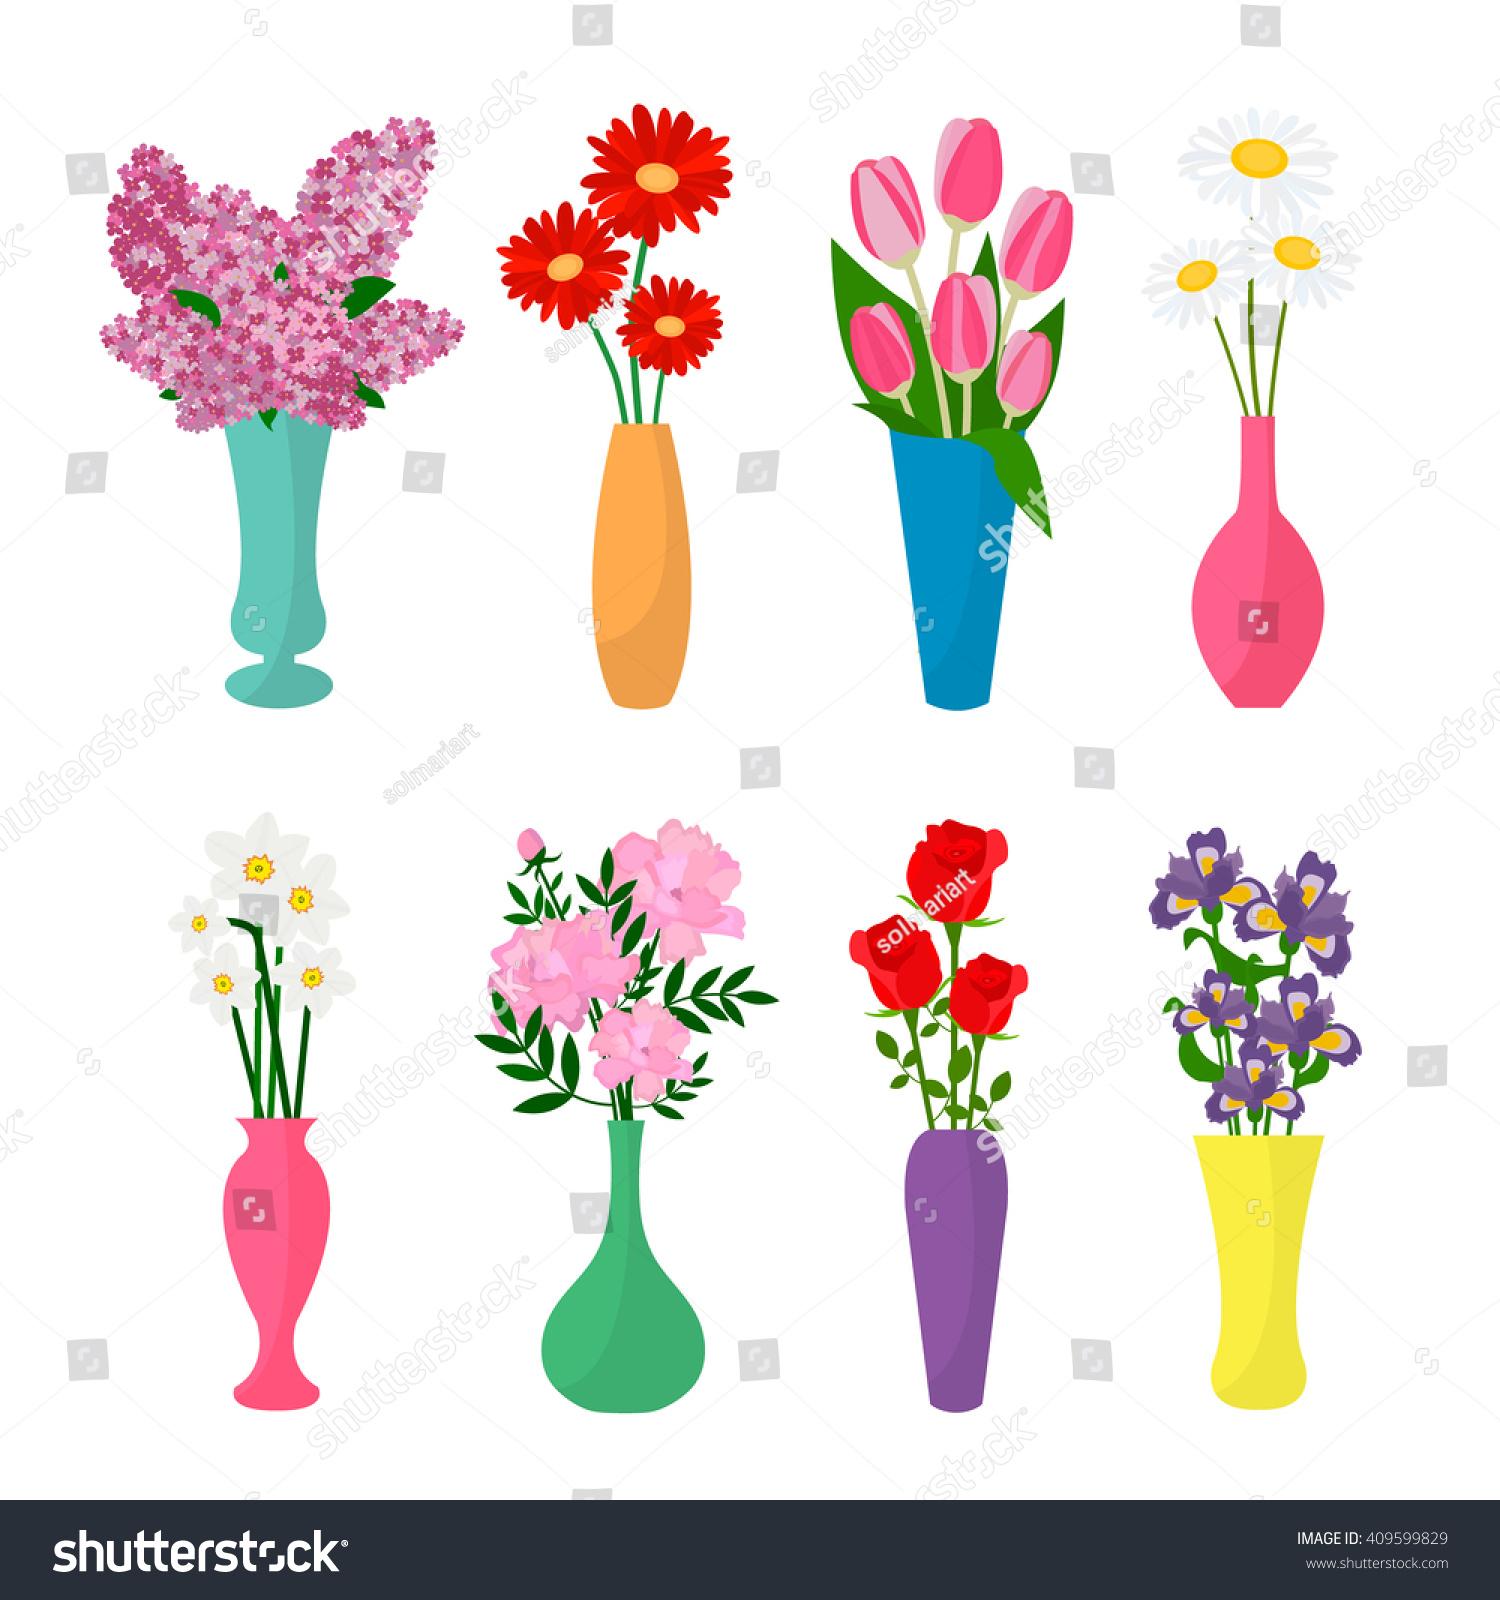 vases of the photography flowers steemit beauty flower amazing vase